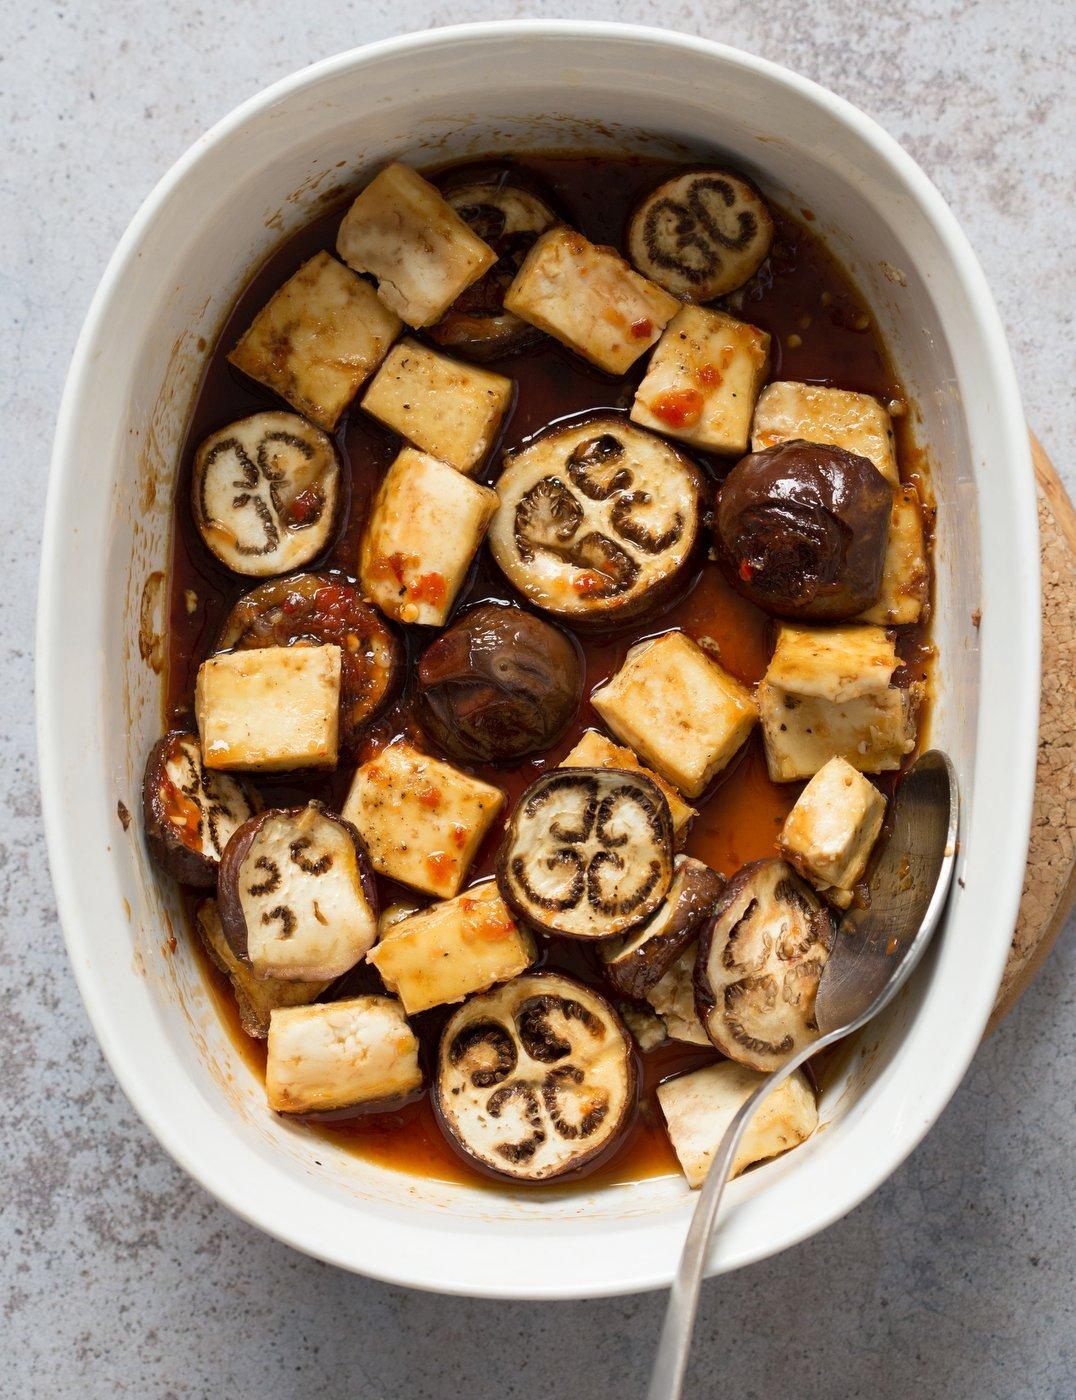 Eggplant & Tofu in Soy Lime Sauce - Baked Eggplant stir fry. Easy 1 Pot meal. Add other veggies of choice. #Vegan #Glutenfree #Nutfree #veganricha #Recipe | VeganRicha.com